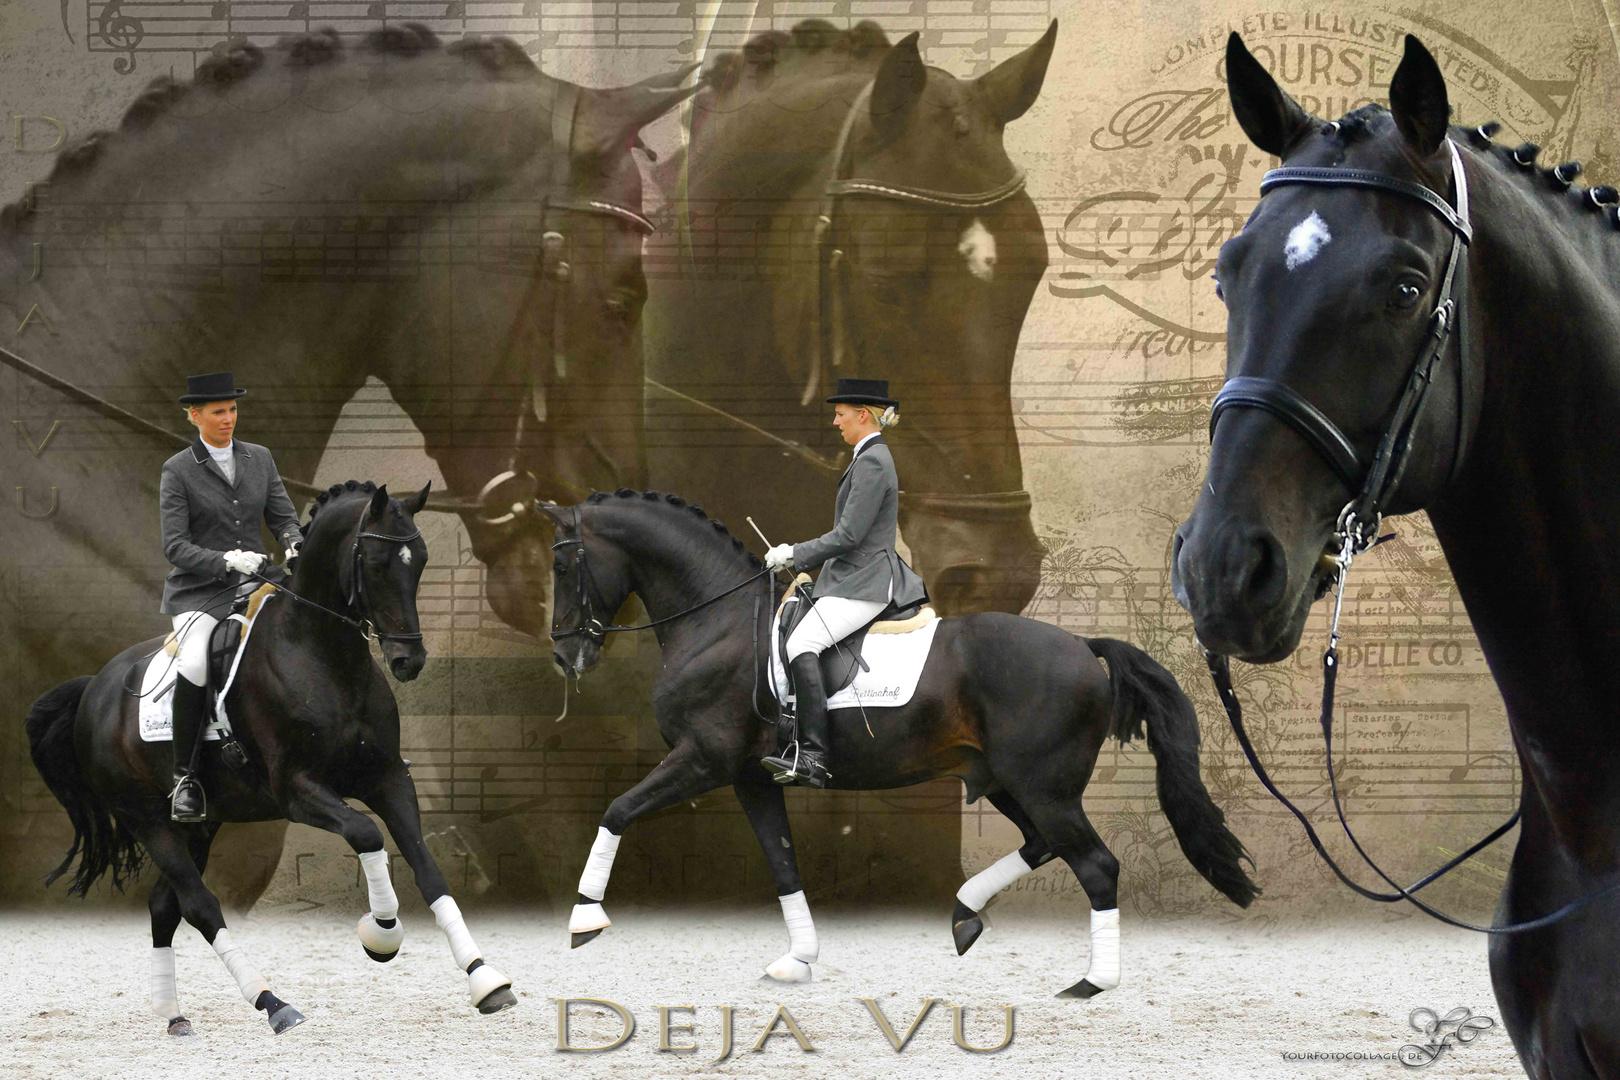 Pferdecollage Deja Vu